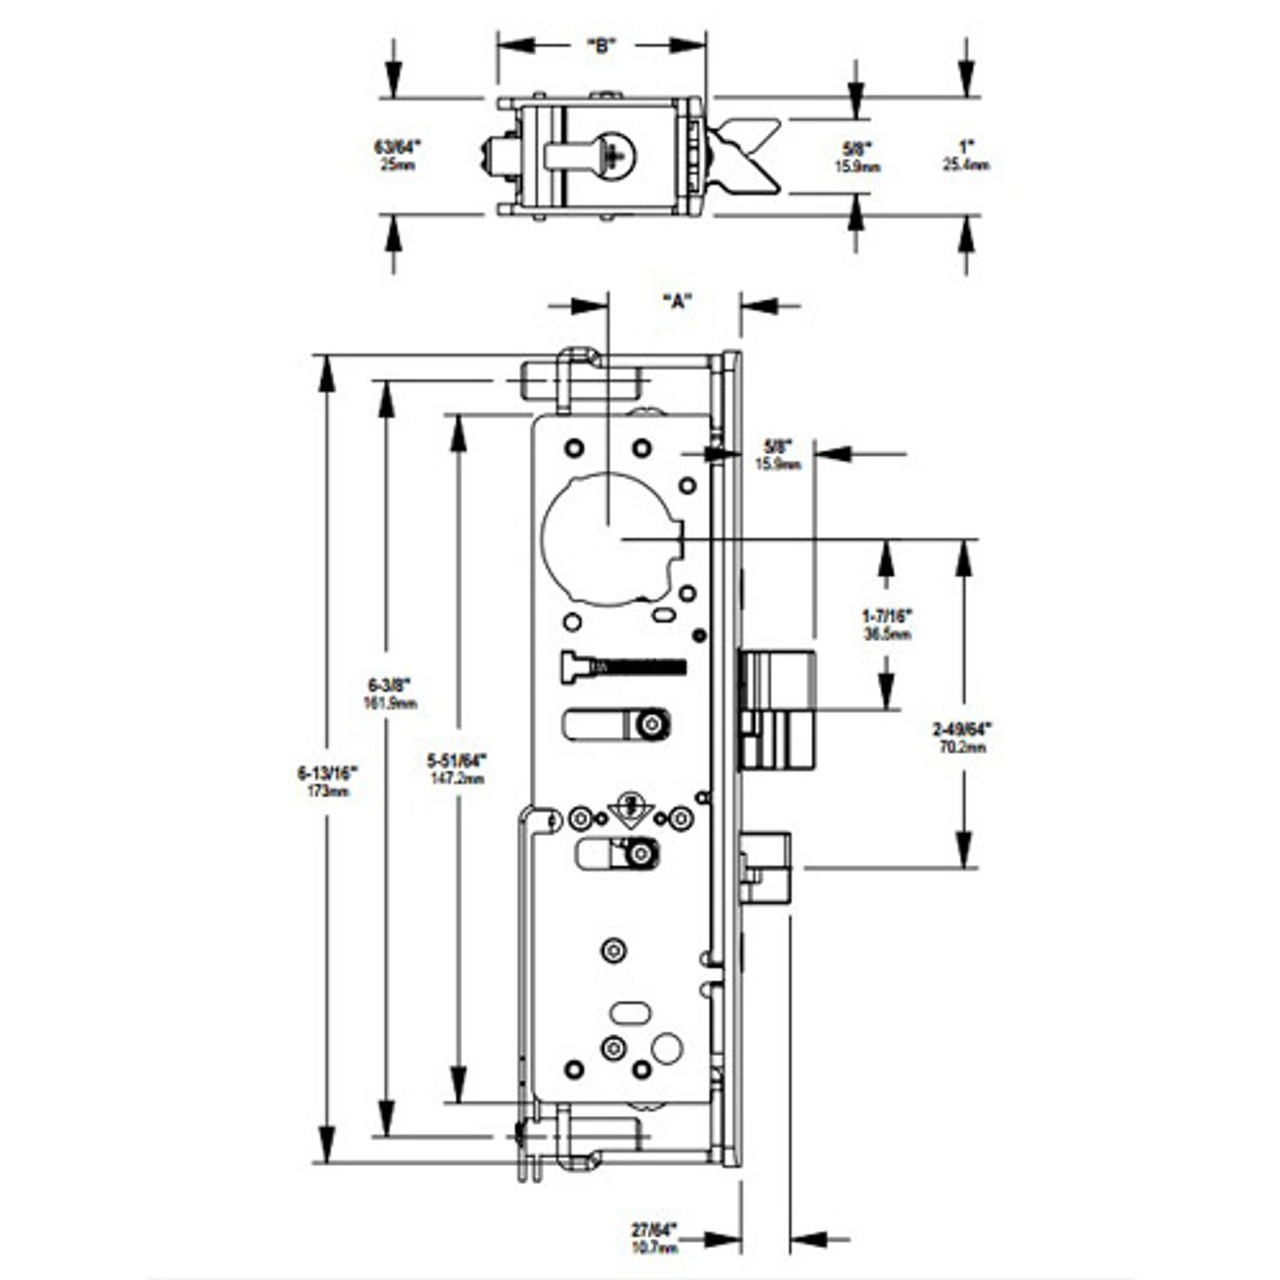 4300-40-121-313 Adams Rite Electrified Deadlatch Dimensional View